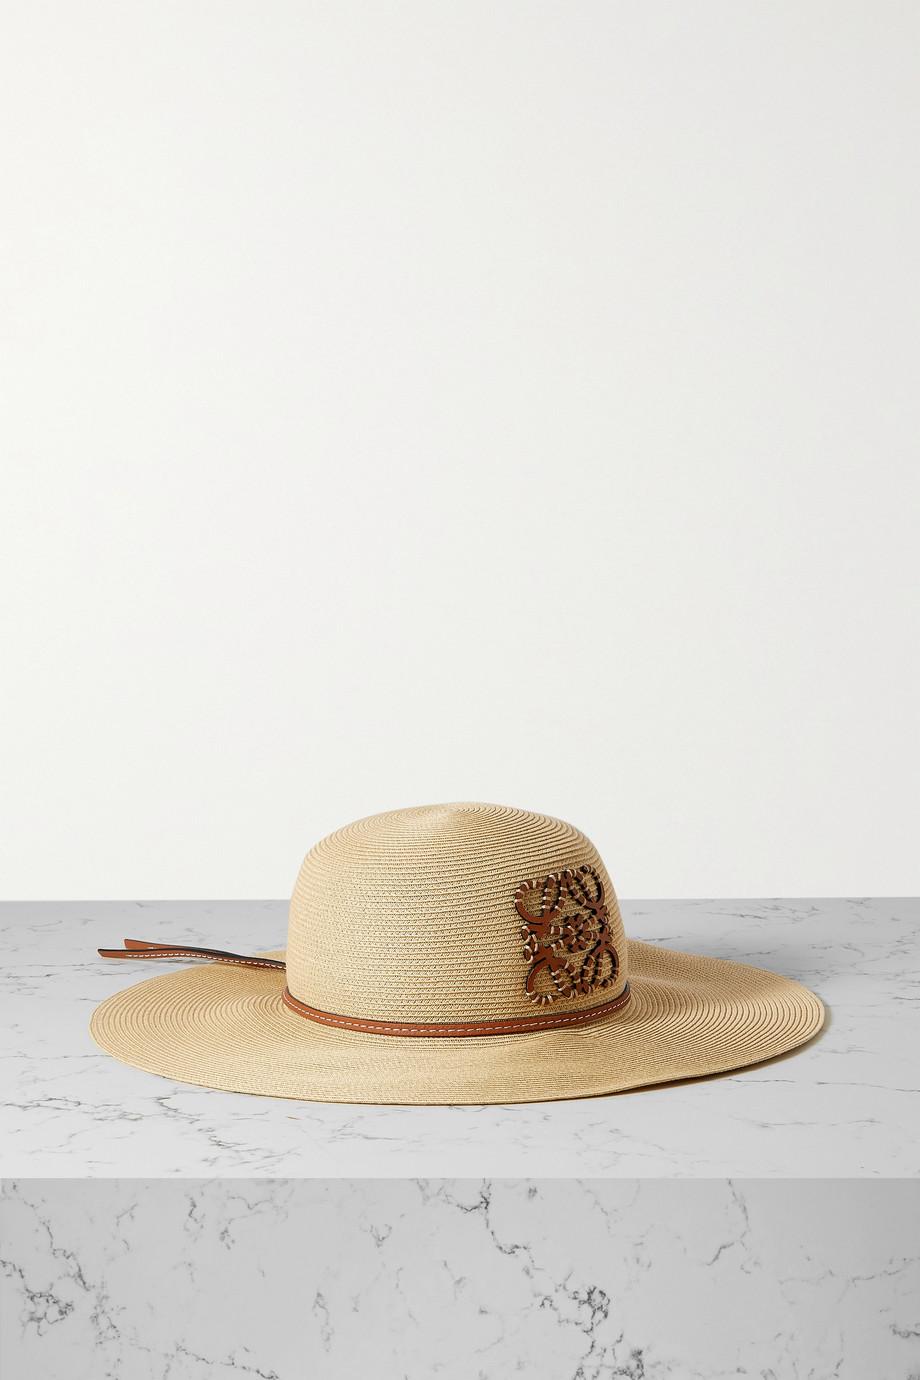 Loewe Chapeau en paille et en cuir x Paula's Ibiza